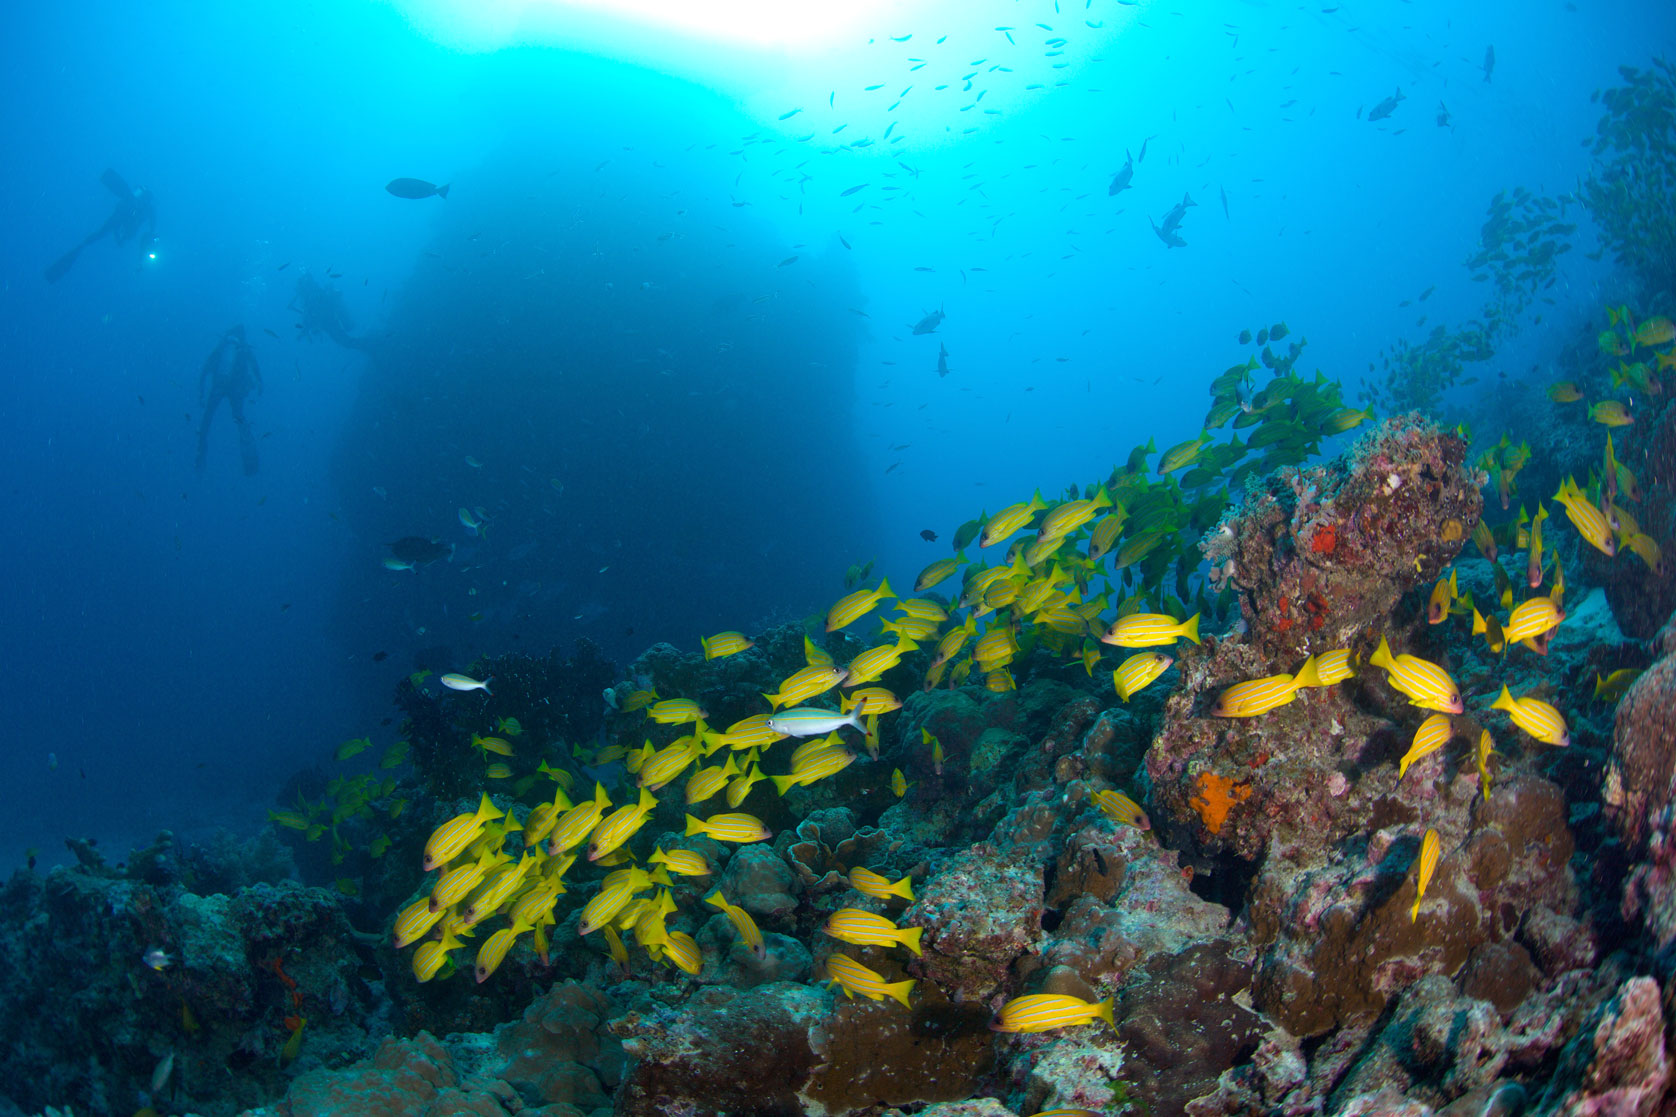 AUS_Great-Barrier-Reef-UW-Lighthouse-Bommie-©15-Thomas-Baechtold-1370.jpg